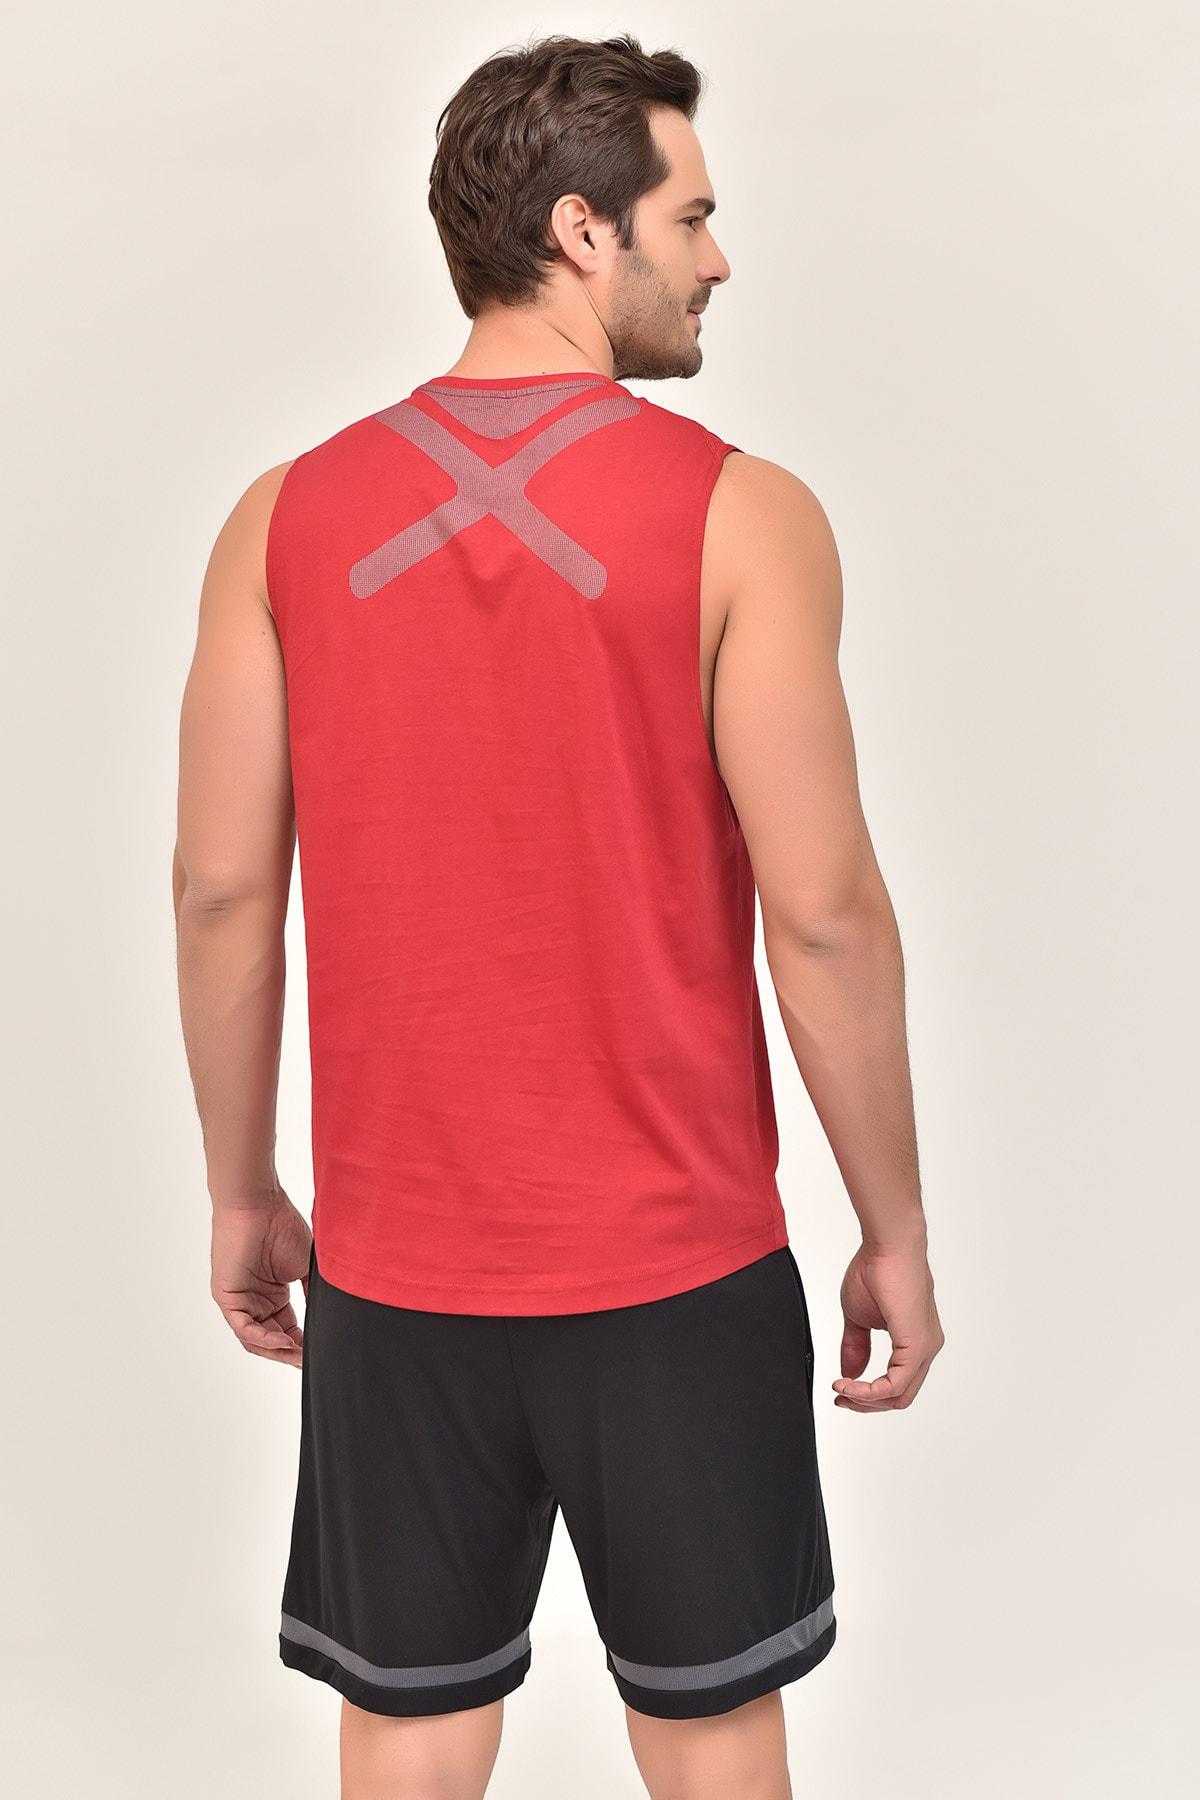 bilcee Bordo Pamuklu Erkek Atlet Fs-1622 2